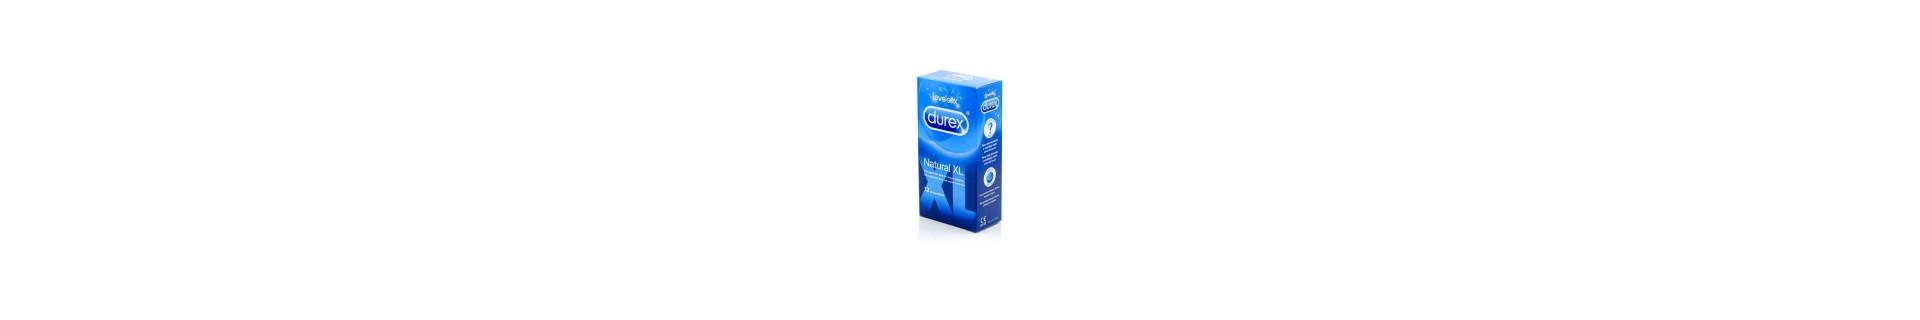 Comprar preservativos tamaño XXL online 【Envío discreto】 ❤️